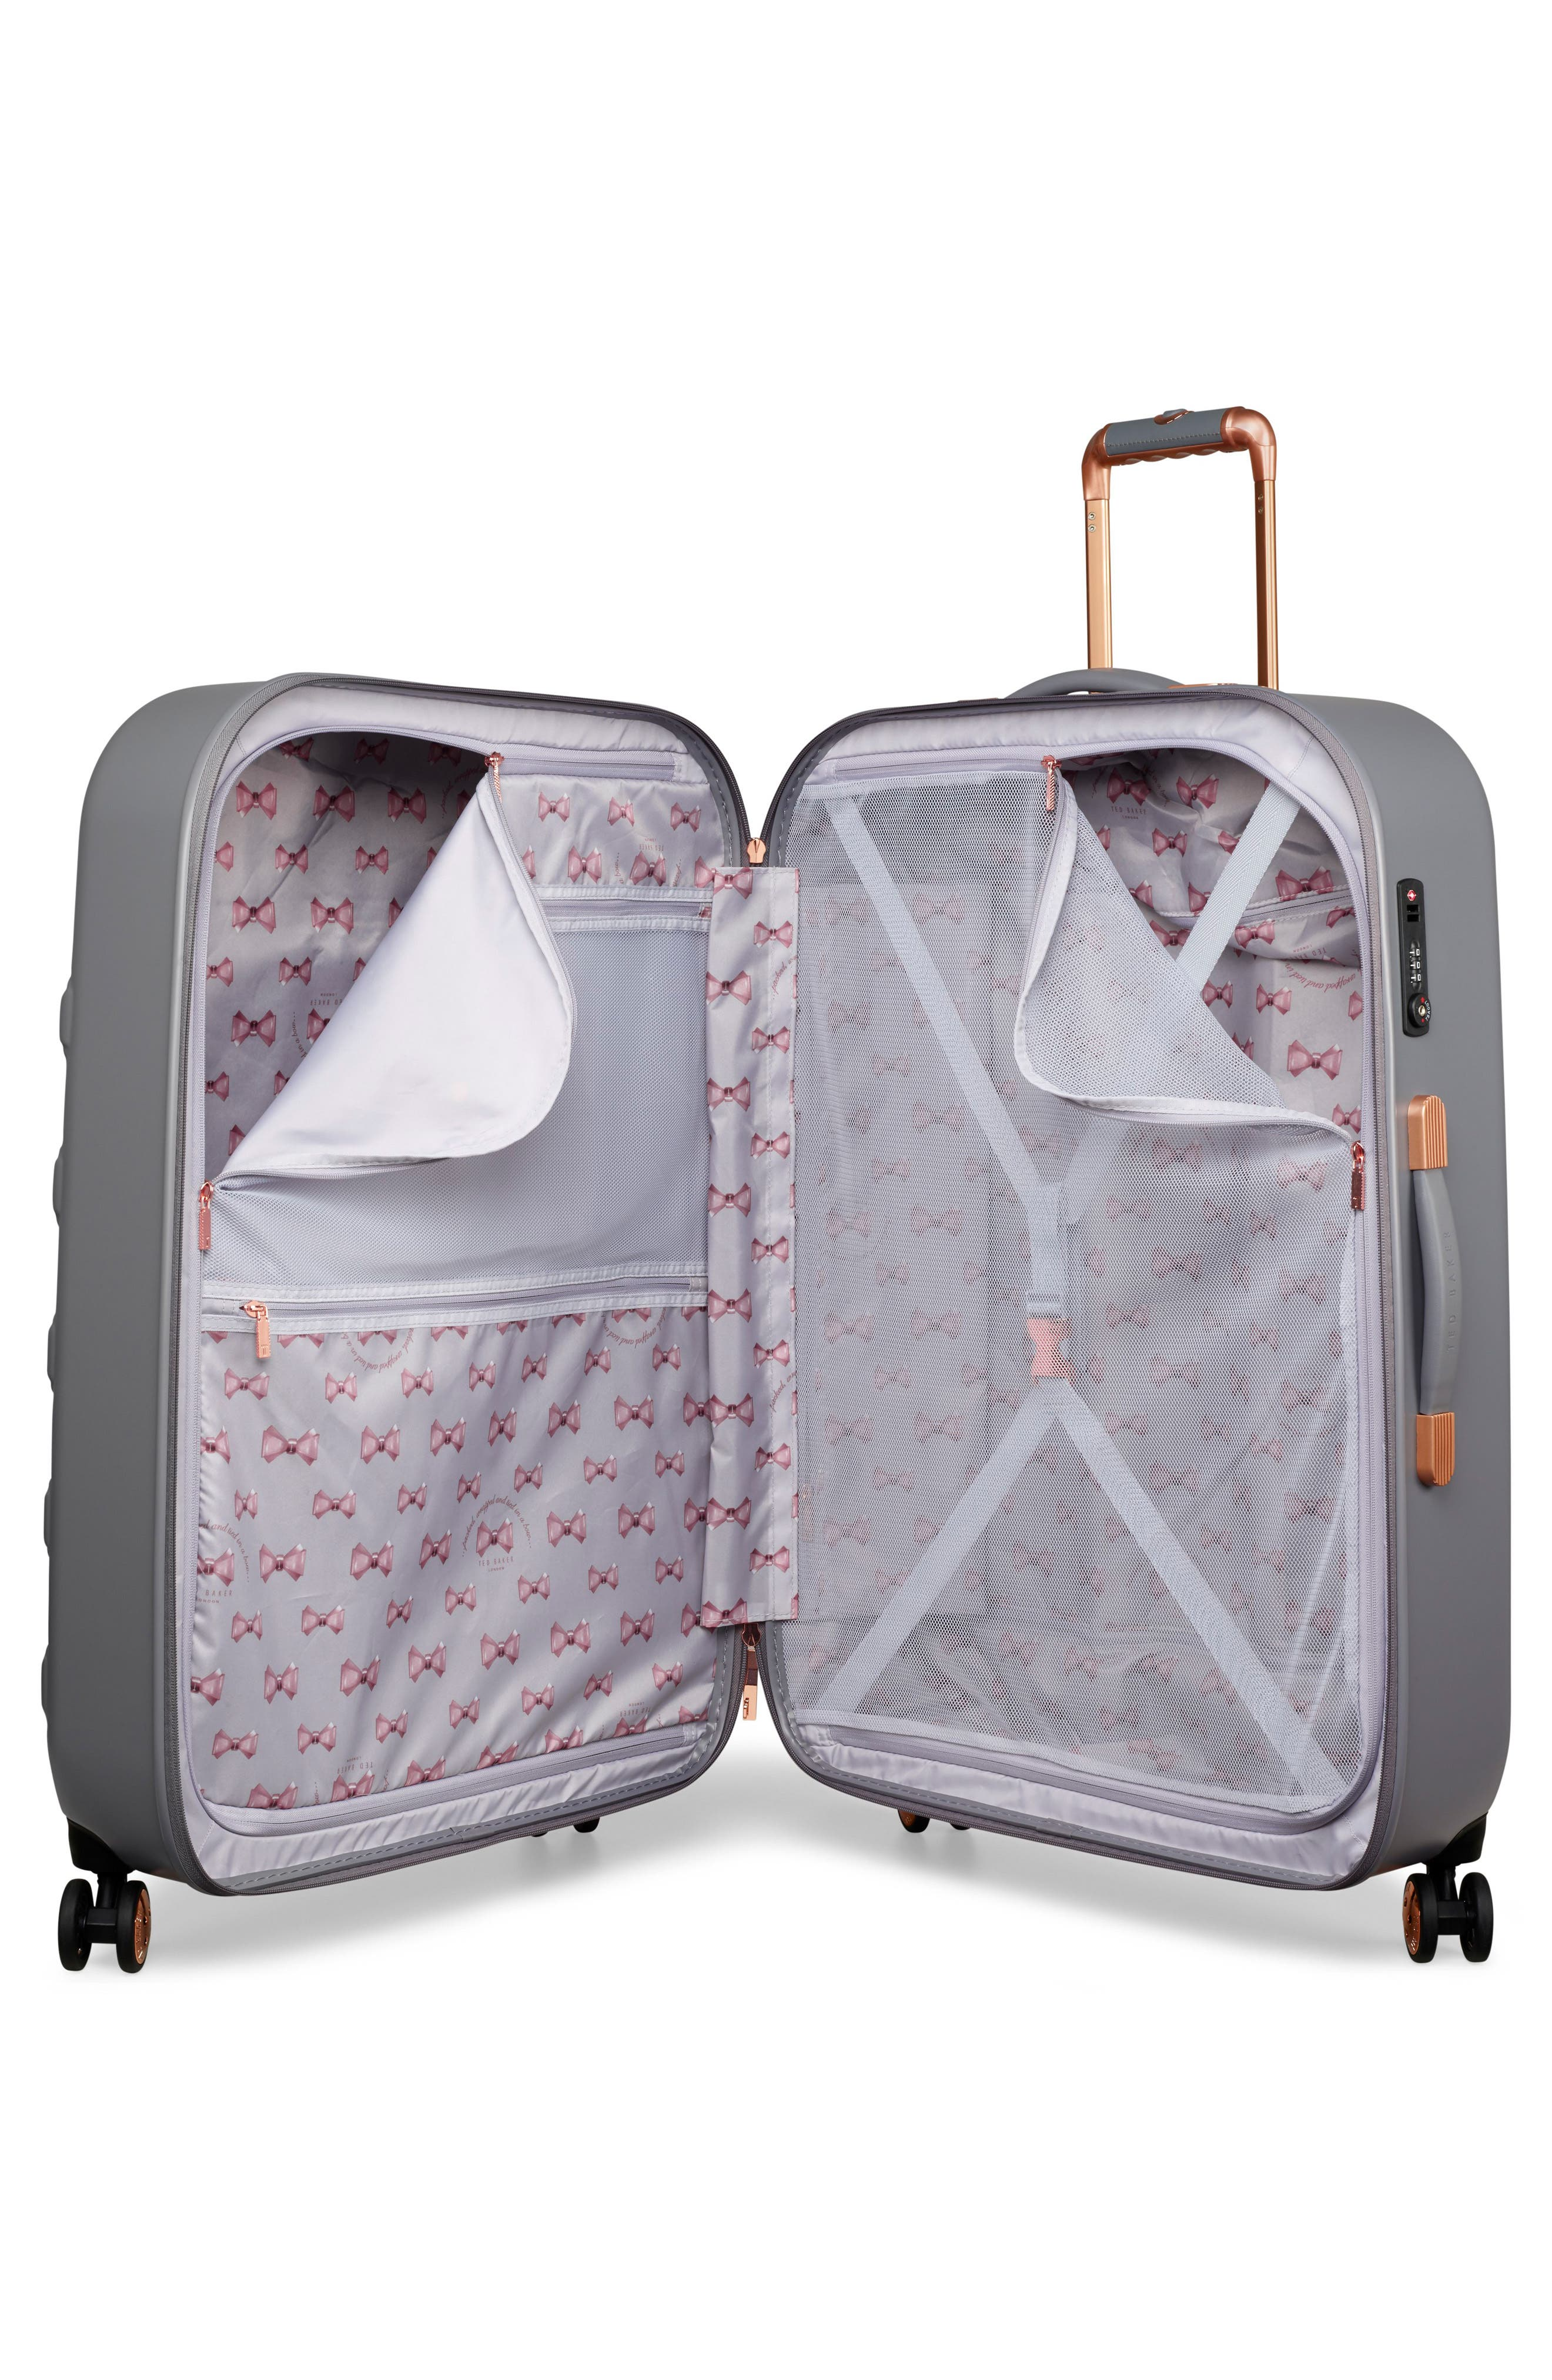 a3e448dde3 Women s Luggage Sale